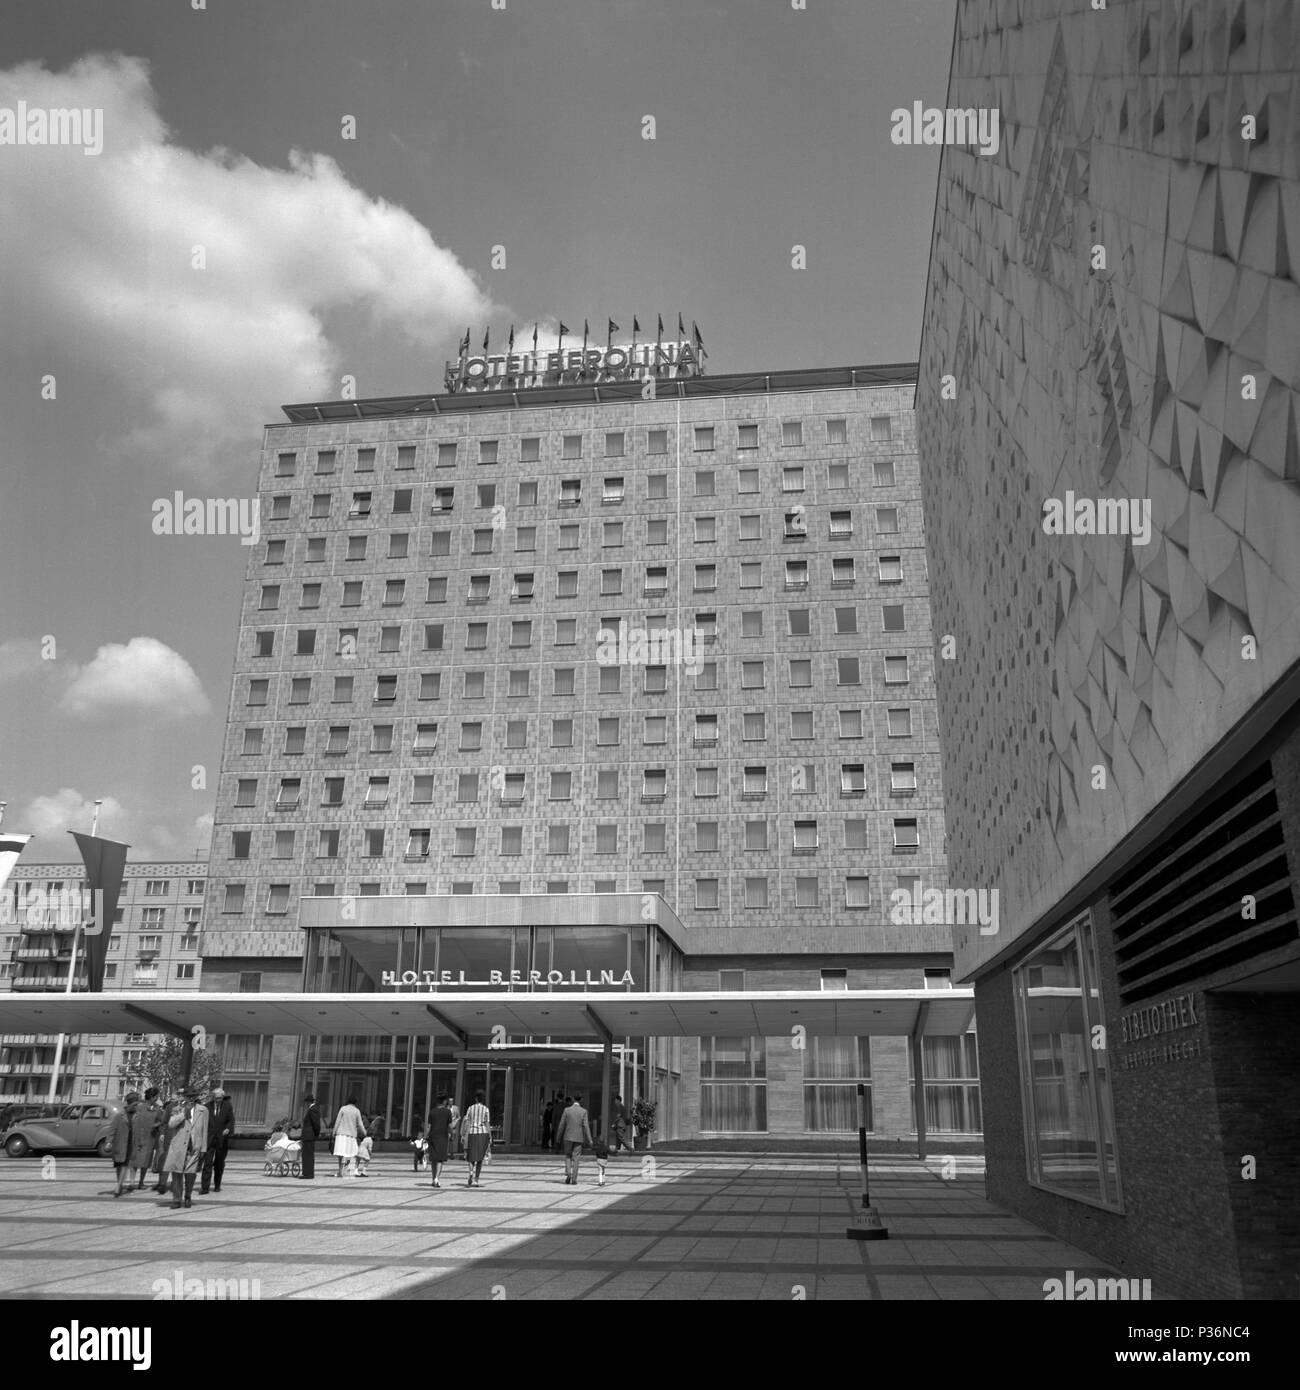 berlin gdr the hotel berolina in karl marx allee stock photo 208516900 alamy. Black Bedroom Furniture Sets. Home Design Ideas